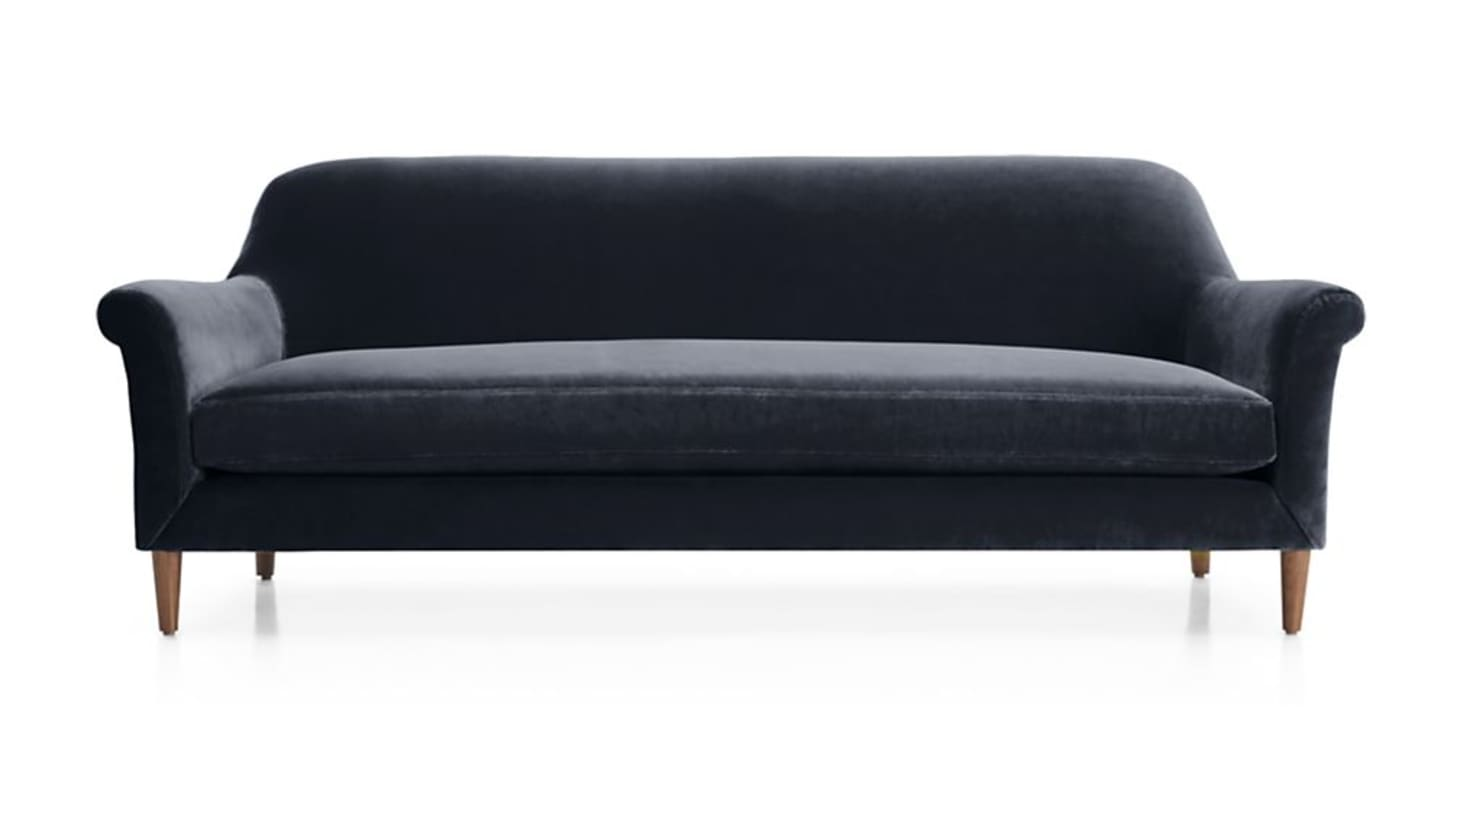 Awe Inspiring Reviewed The Most Comfortable Sofas At Crate Barrel Inzonedesignstudio Interior Chair Design Inzonedesignstudiocom